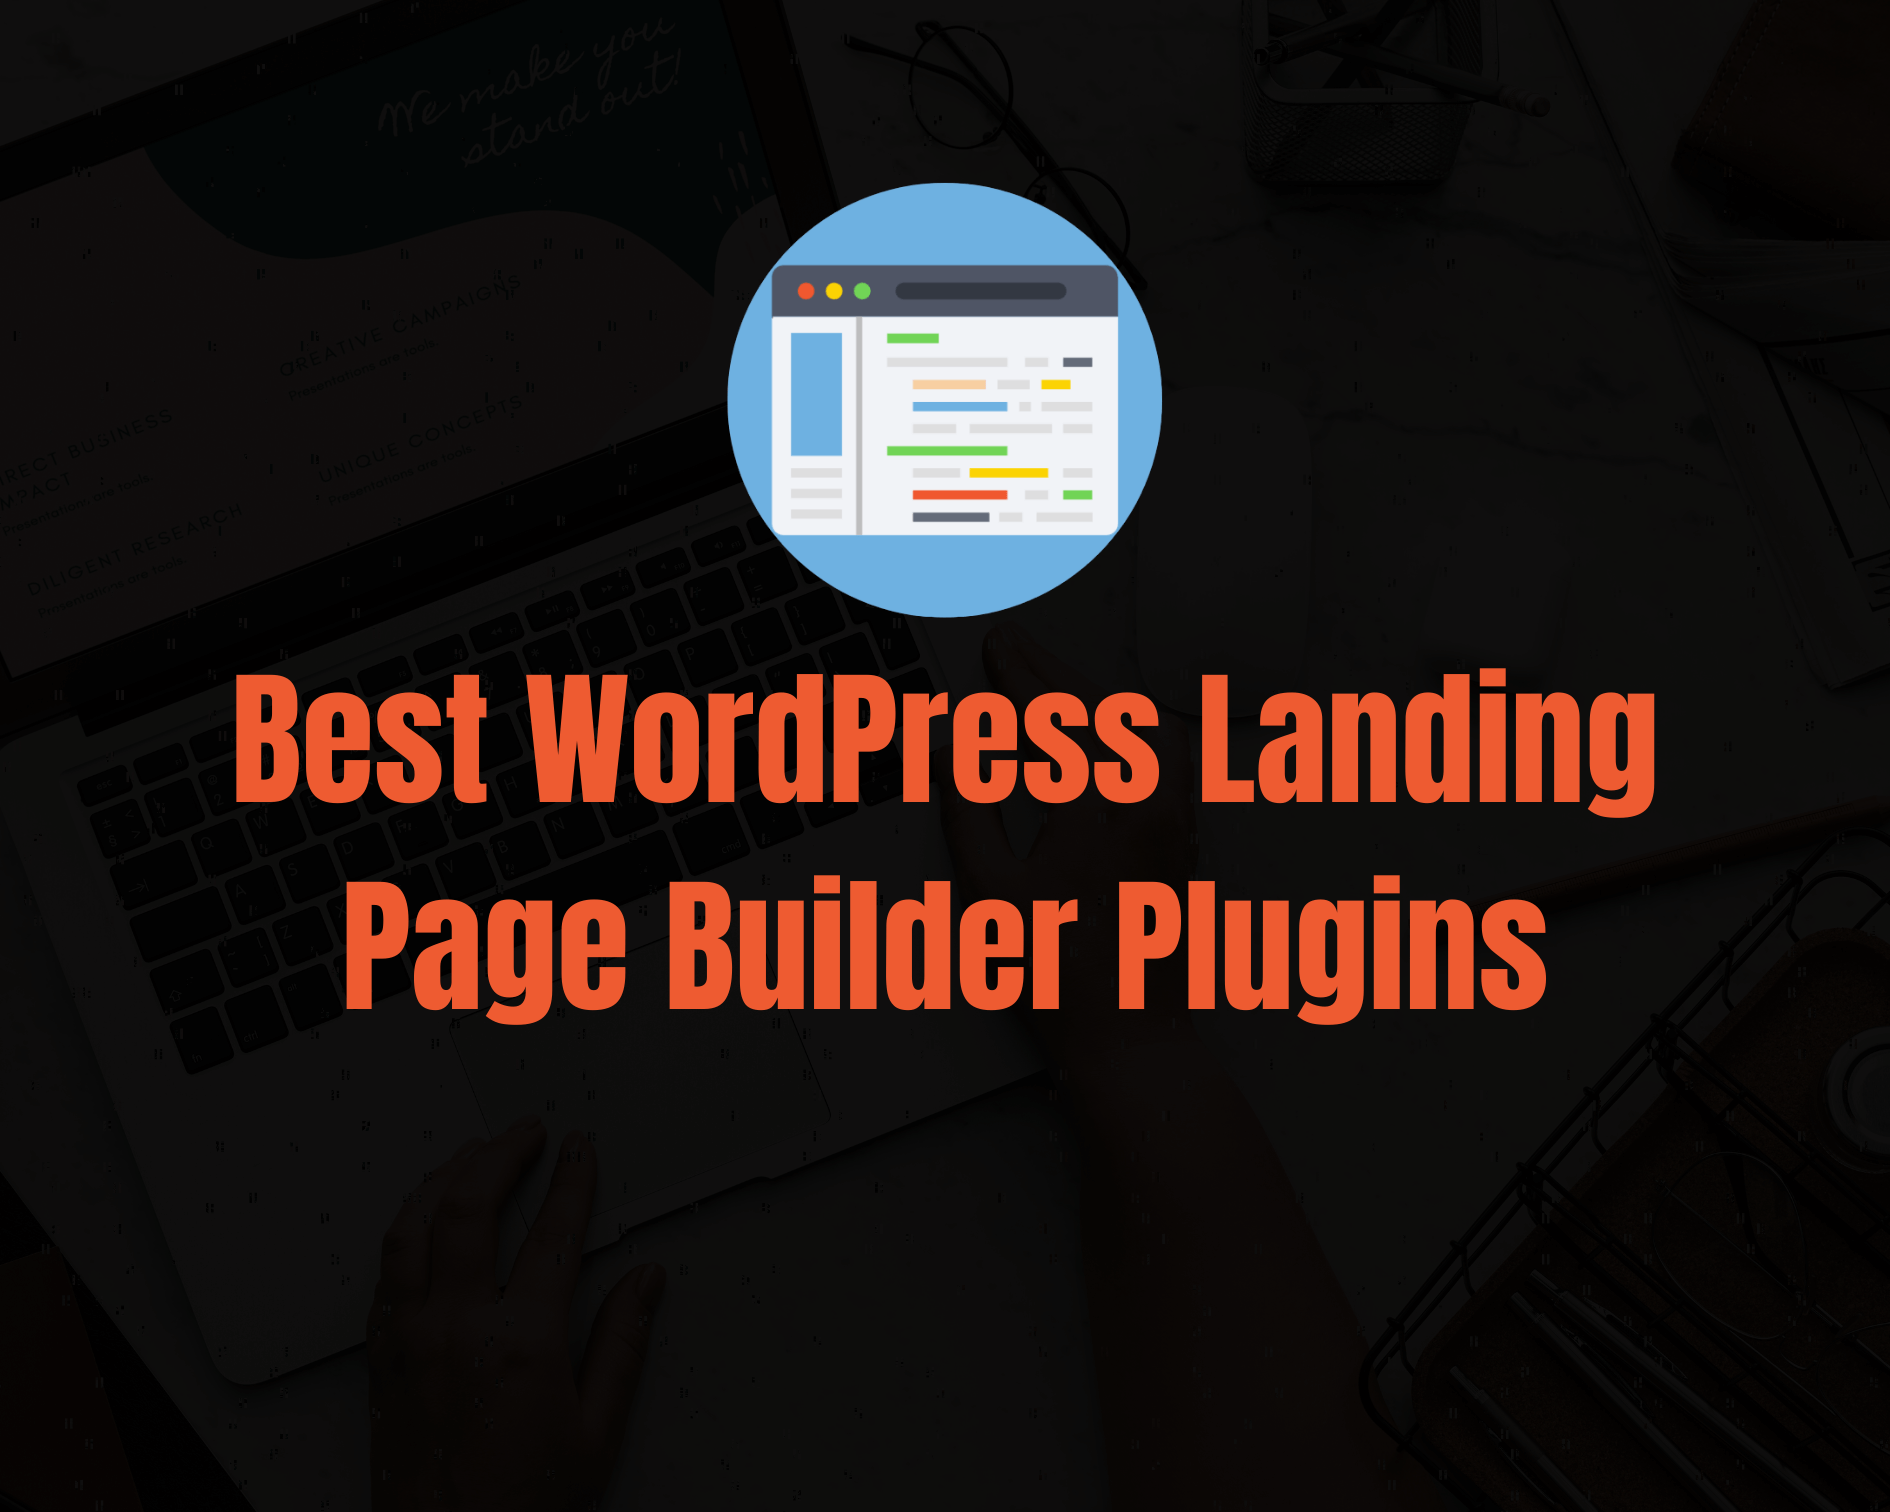 7 Best WordPress Landing Page Builder Plugins for 2021